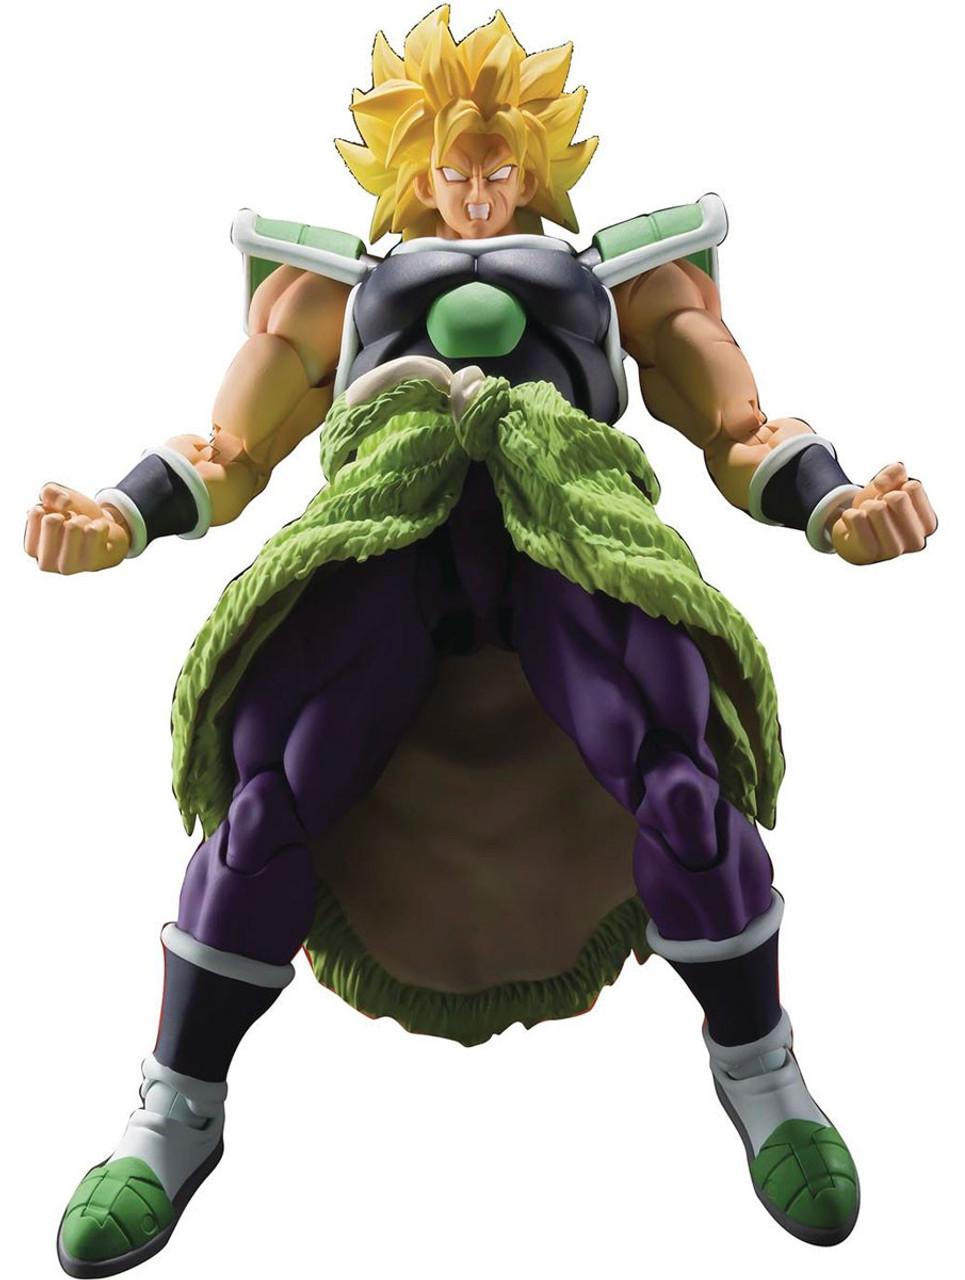 2 PRE-ORDER S.H.Figuarts Dragon Ball Super Broly Movie Action Figure Ver